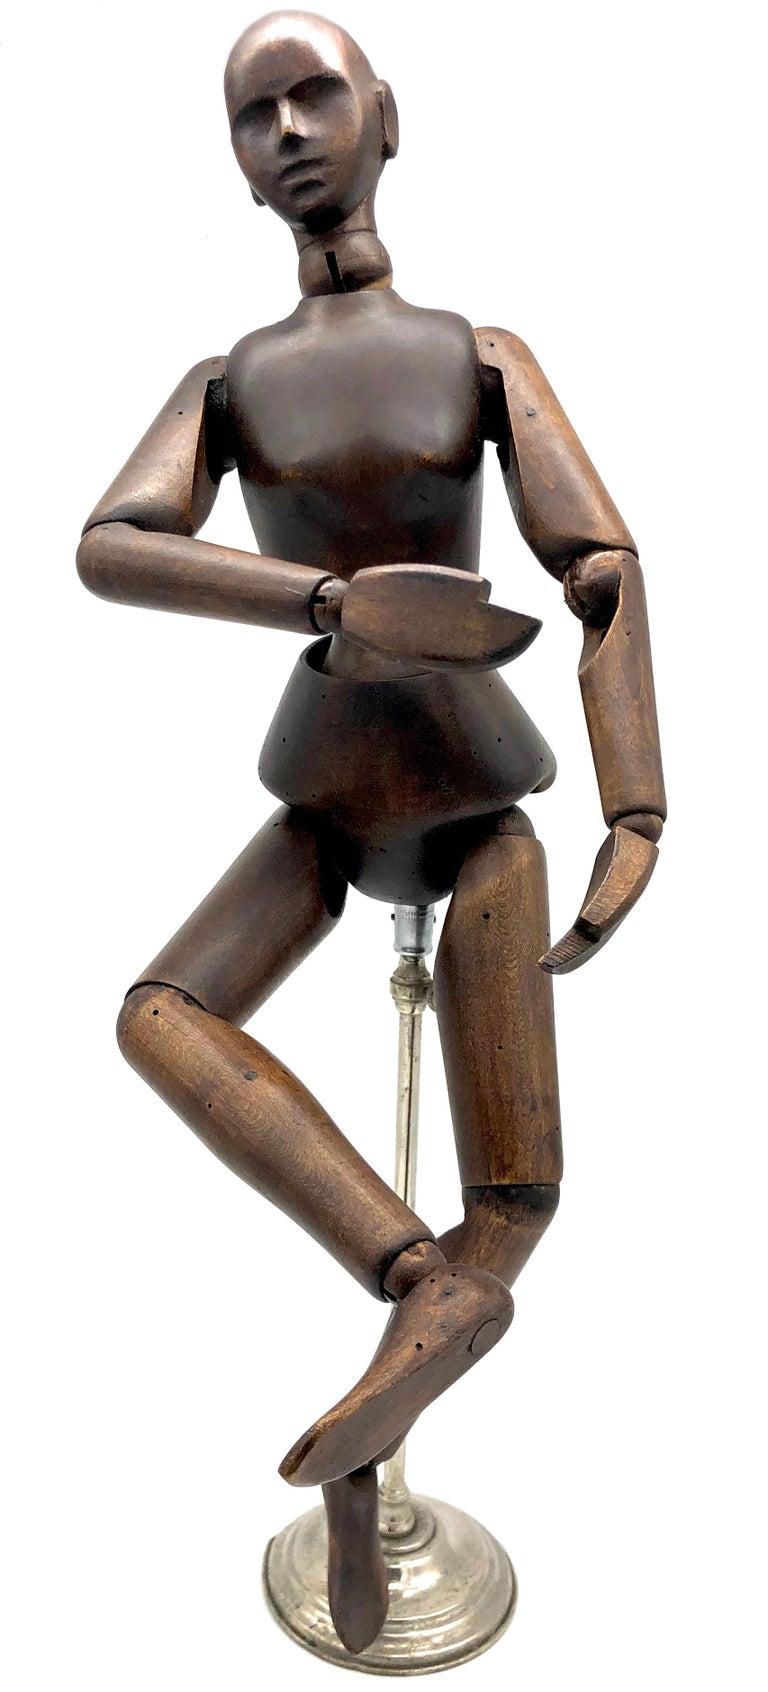 Antique Female Artist Mannequin Figure Sculpture Lime Tree, France For Sale 2